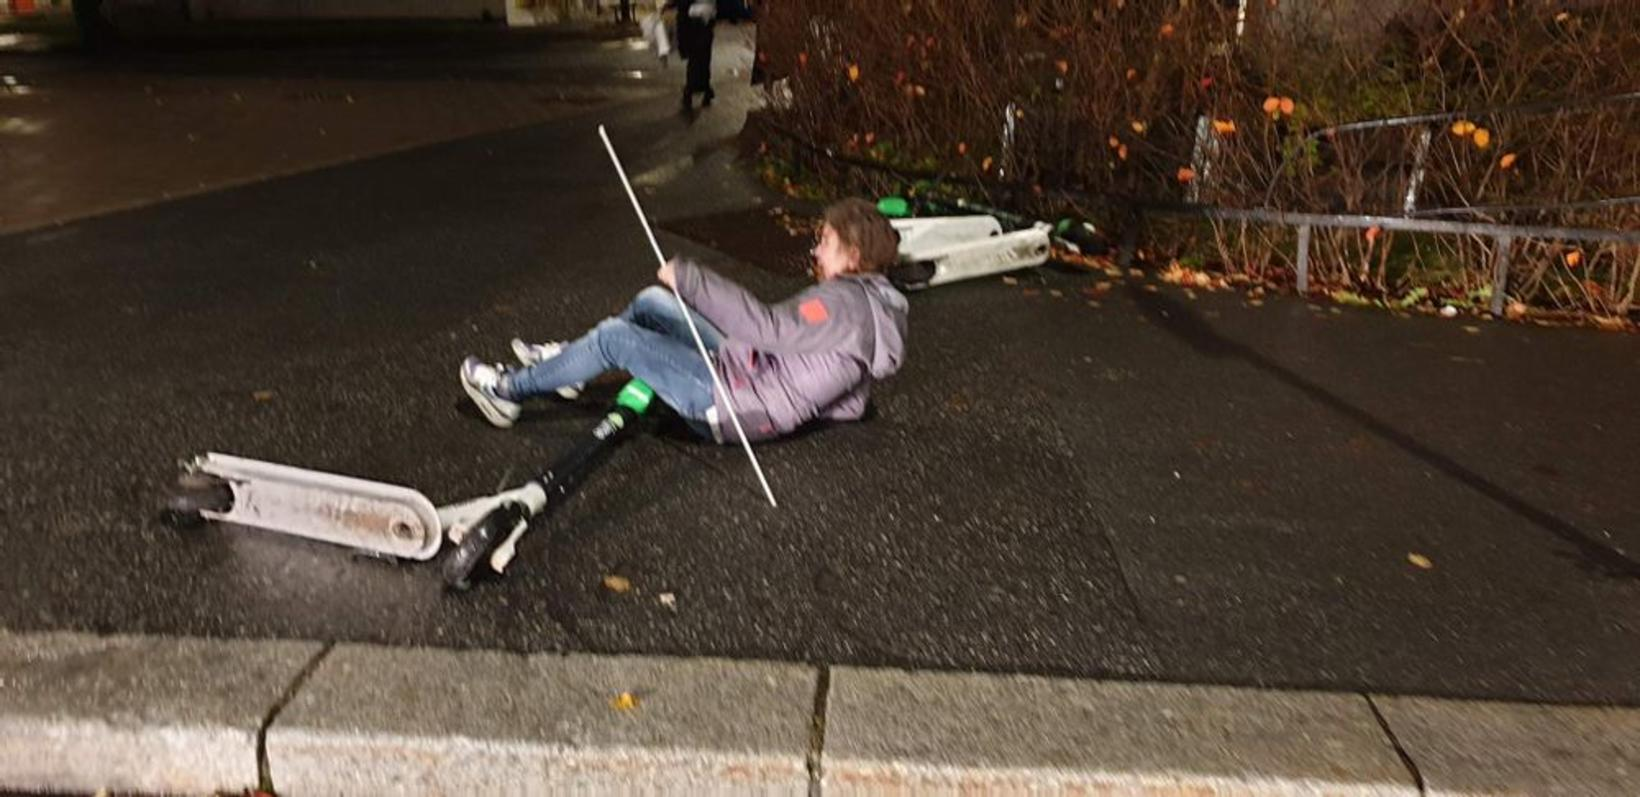 Toini Hämeenkorpi, 56 ára gömul blind kona, datt um rafmagnshlaupahjól …